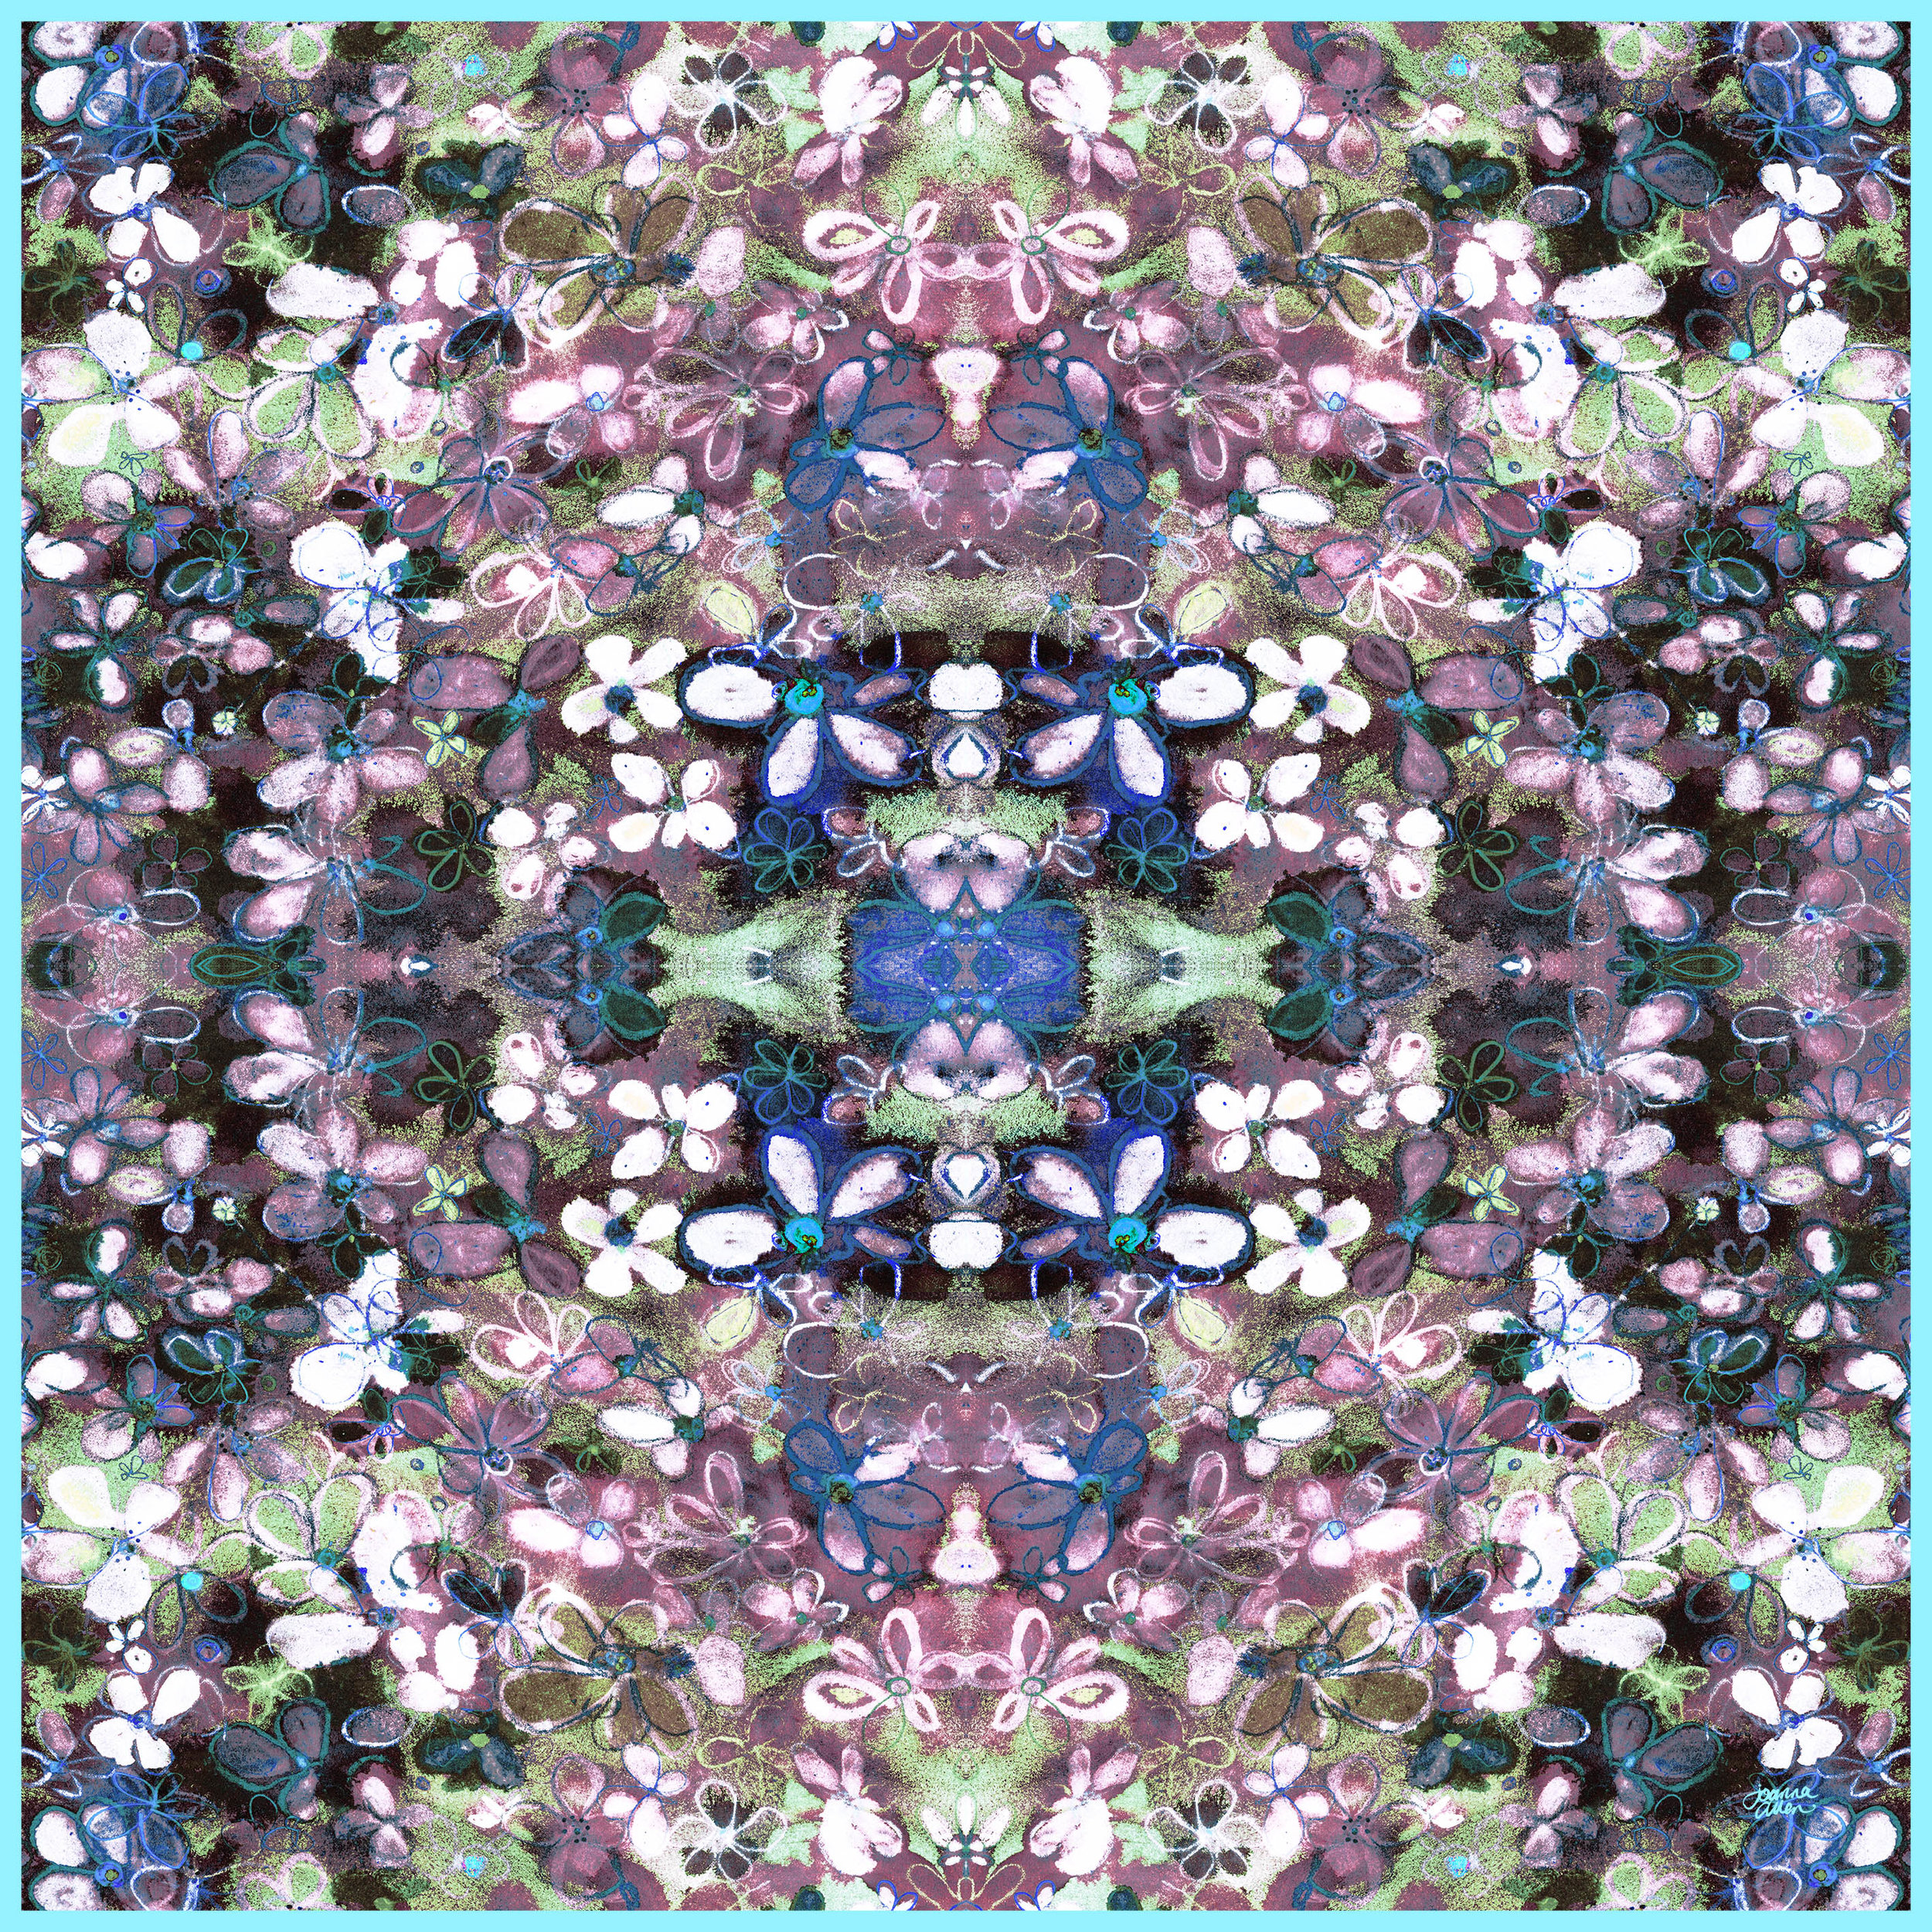 Allen_Joanna Ditsy Tourmaline scarf 90 x 90 cmx_05.jpg